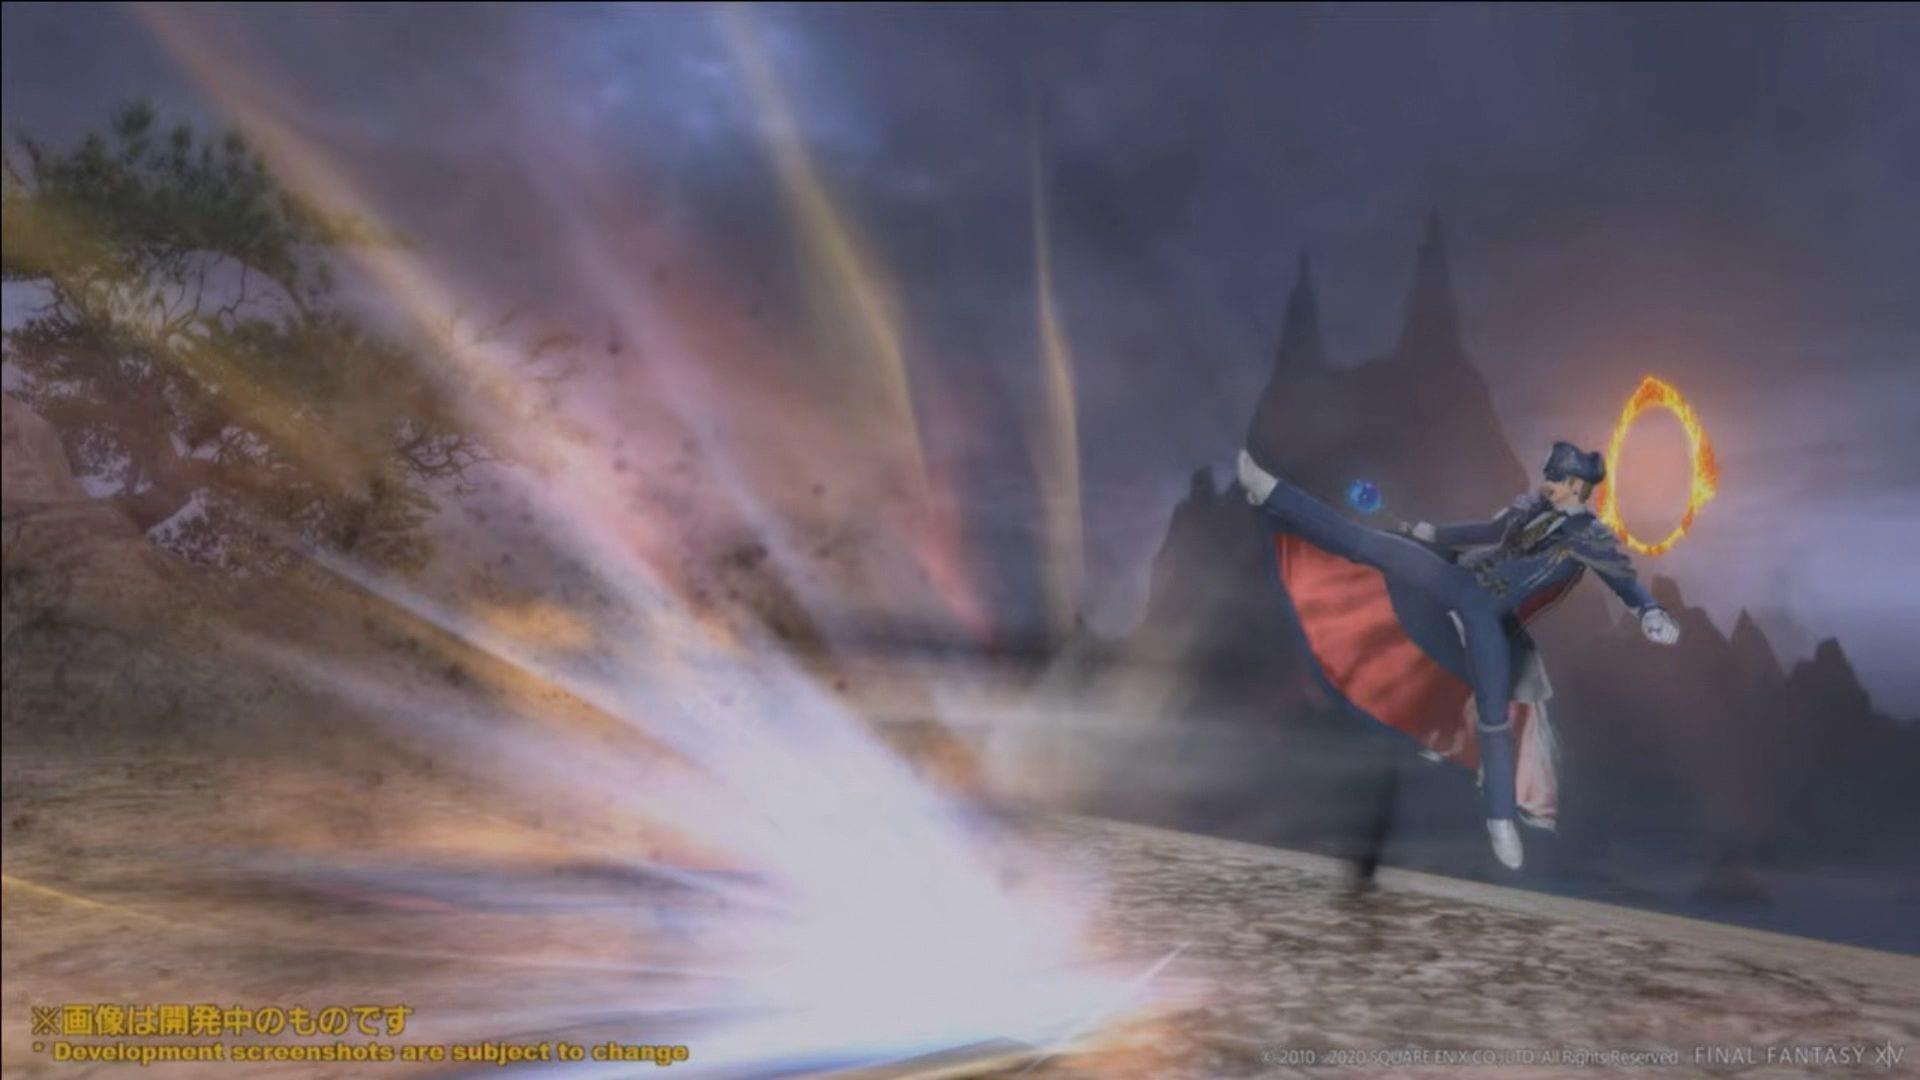 Final-Fantasy-XIV-Screenshot-2020-11-27-13-18-37.jpg